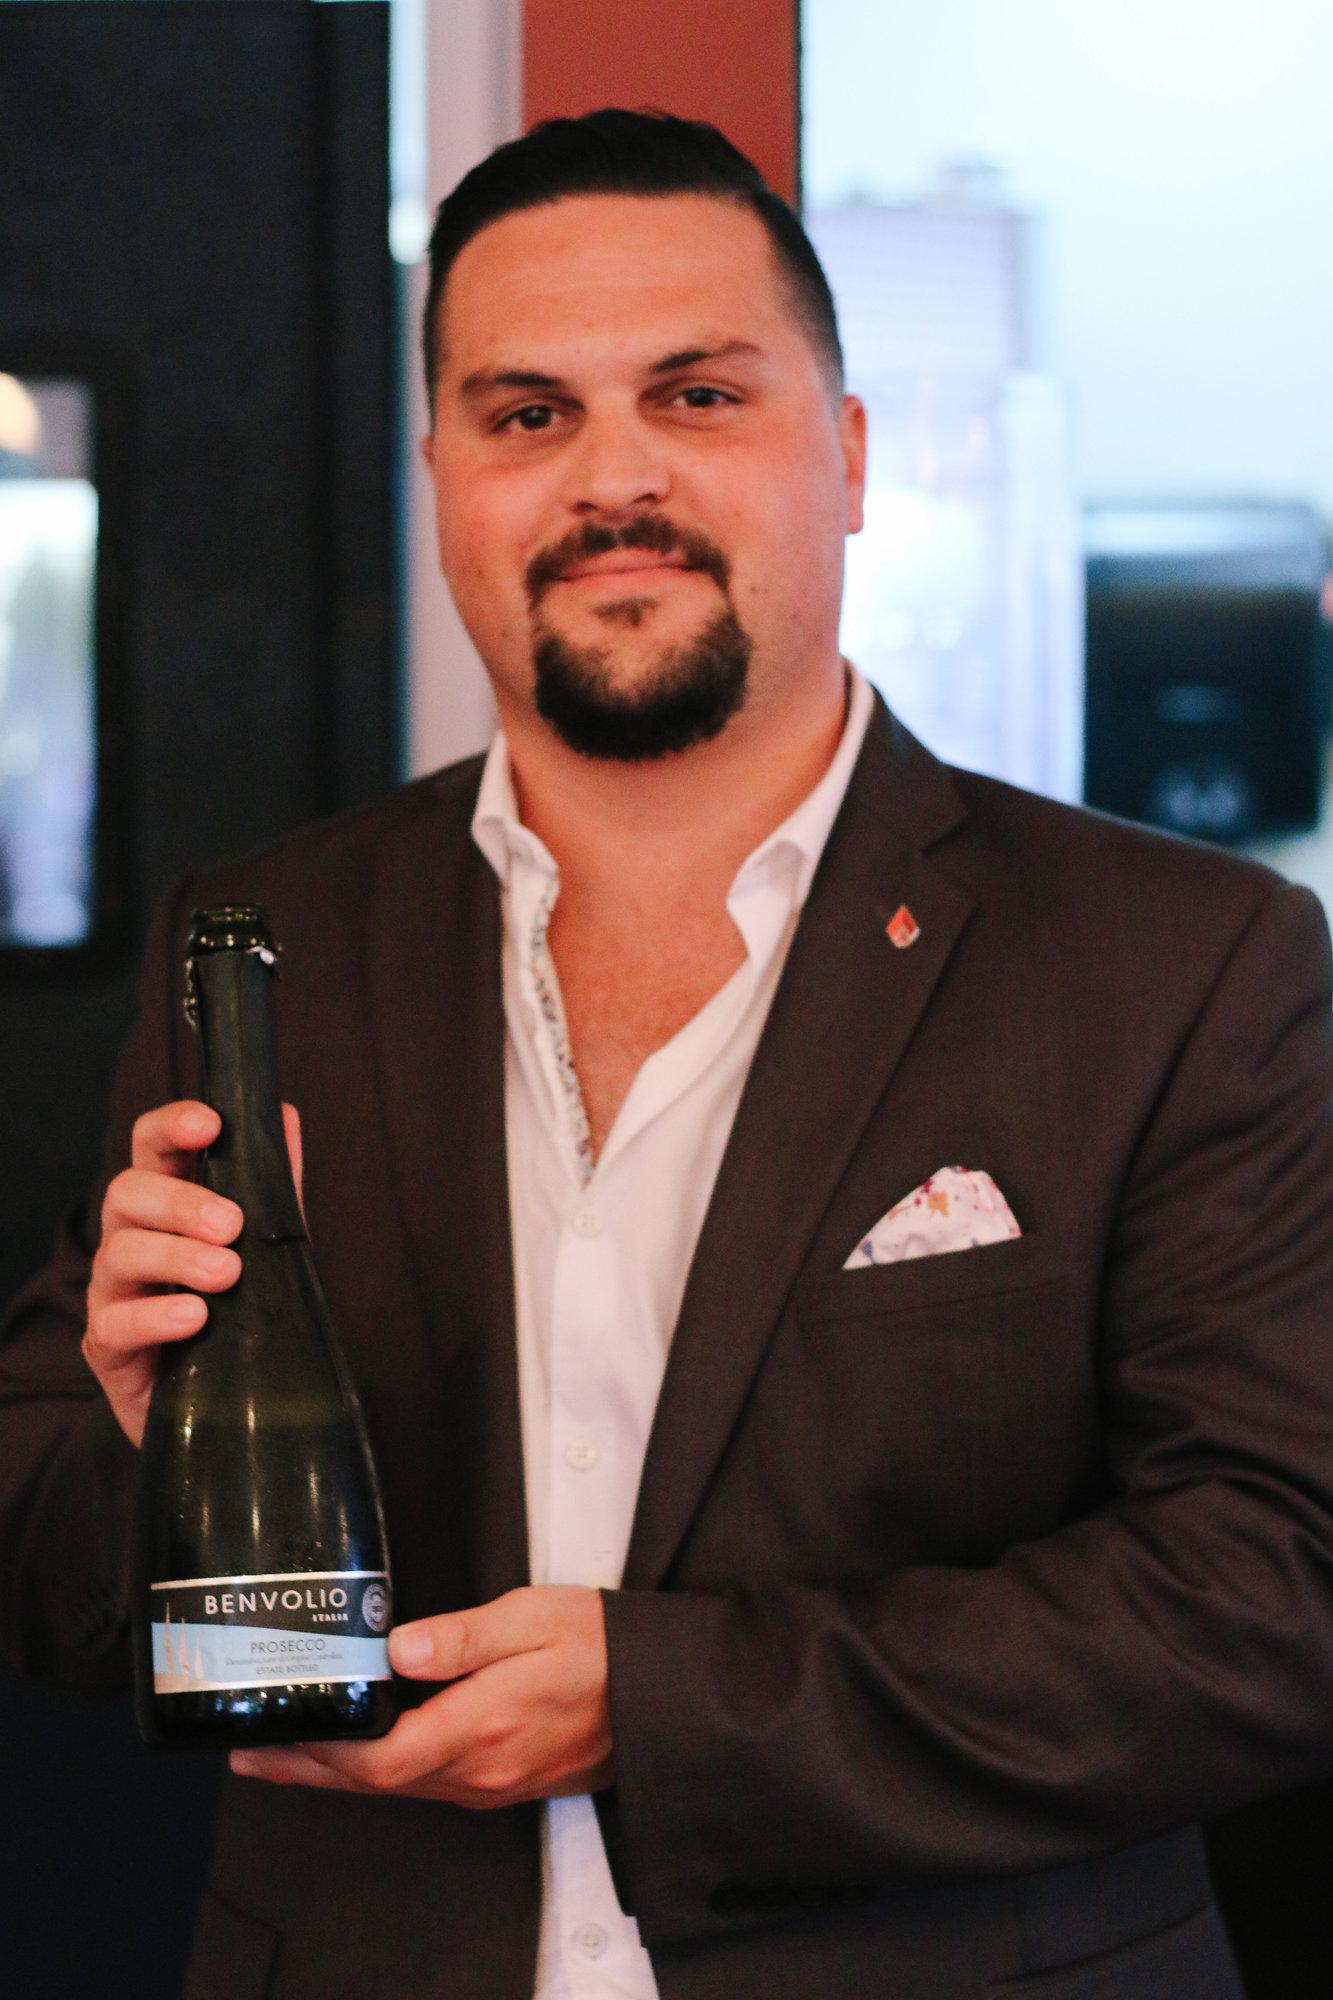 Pablo Suarez, The Wine Maverick